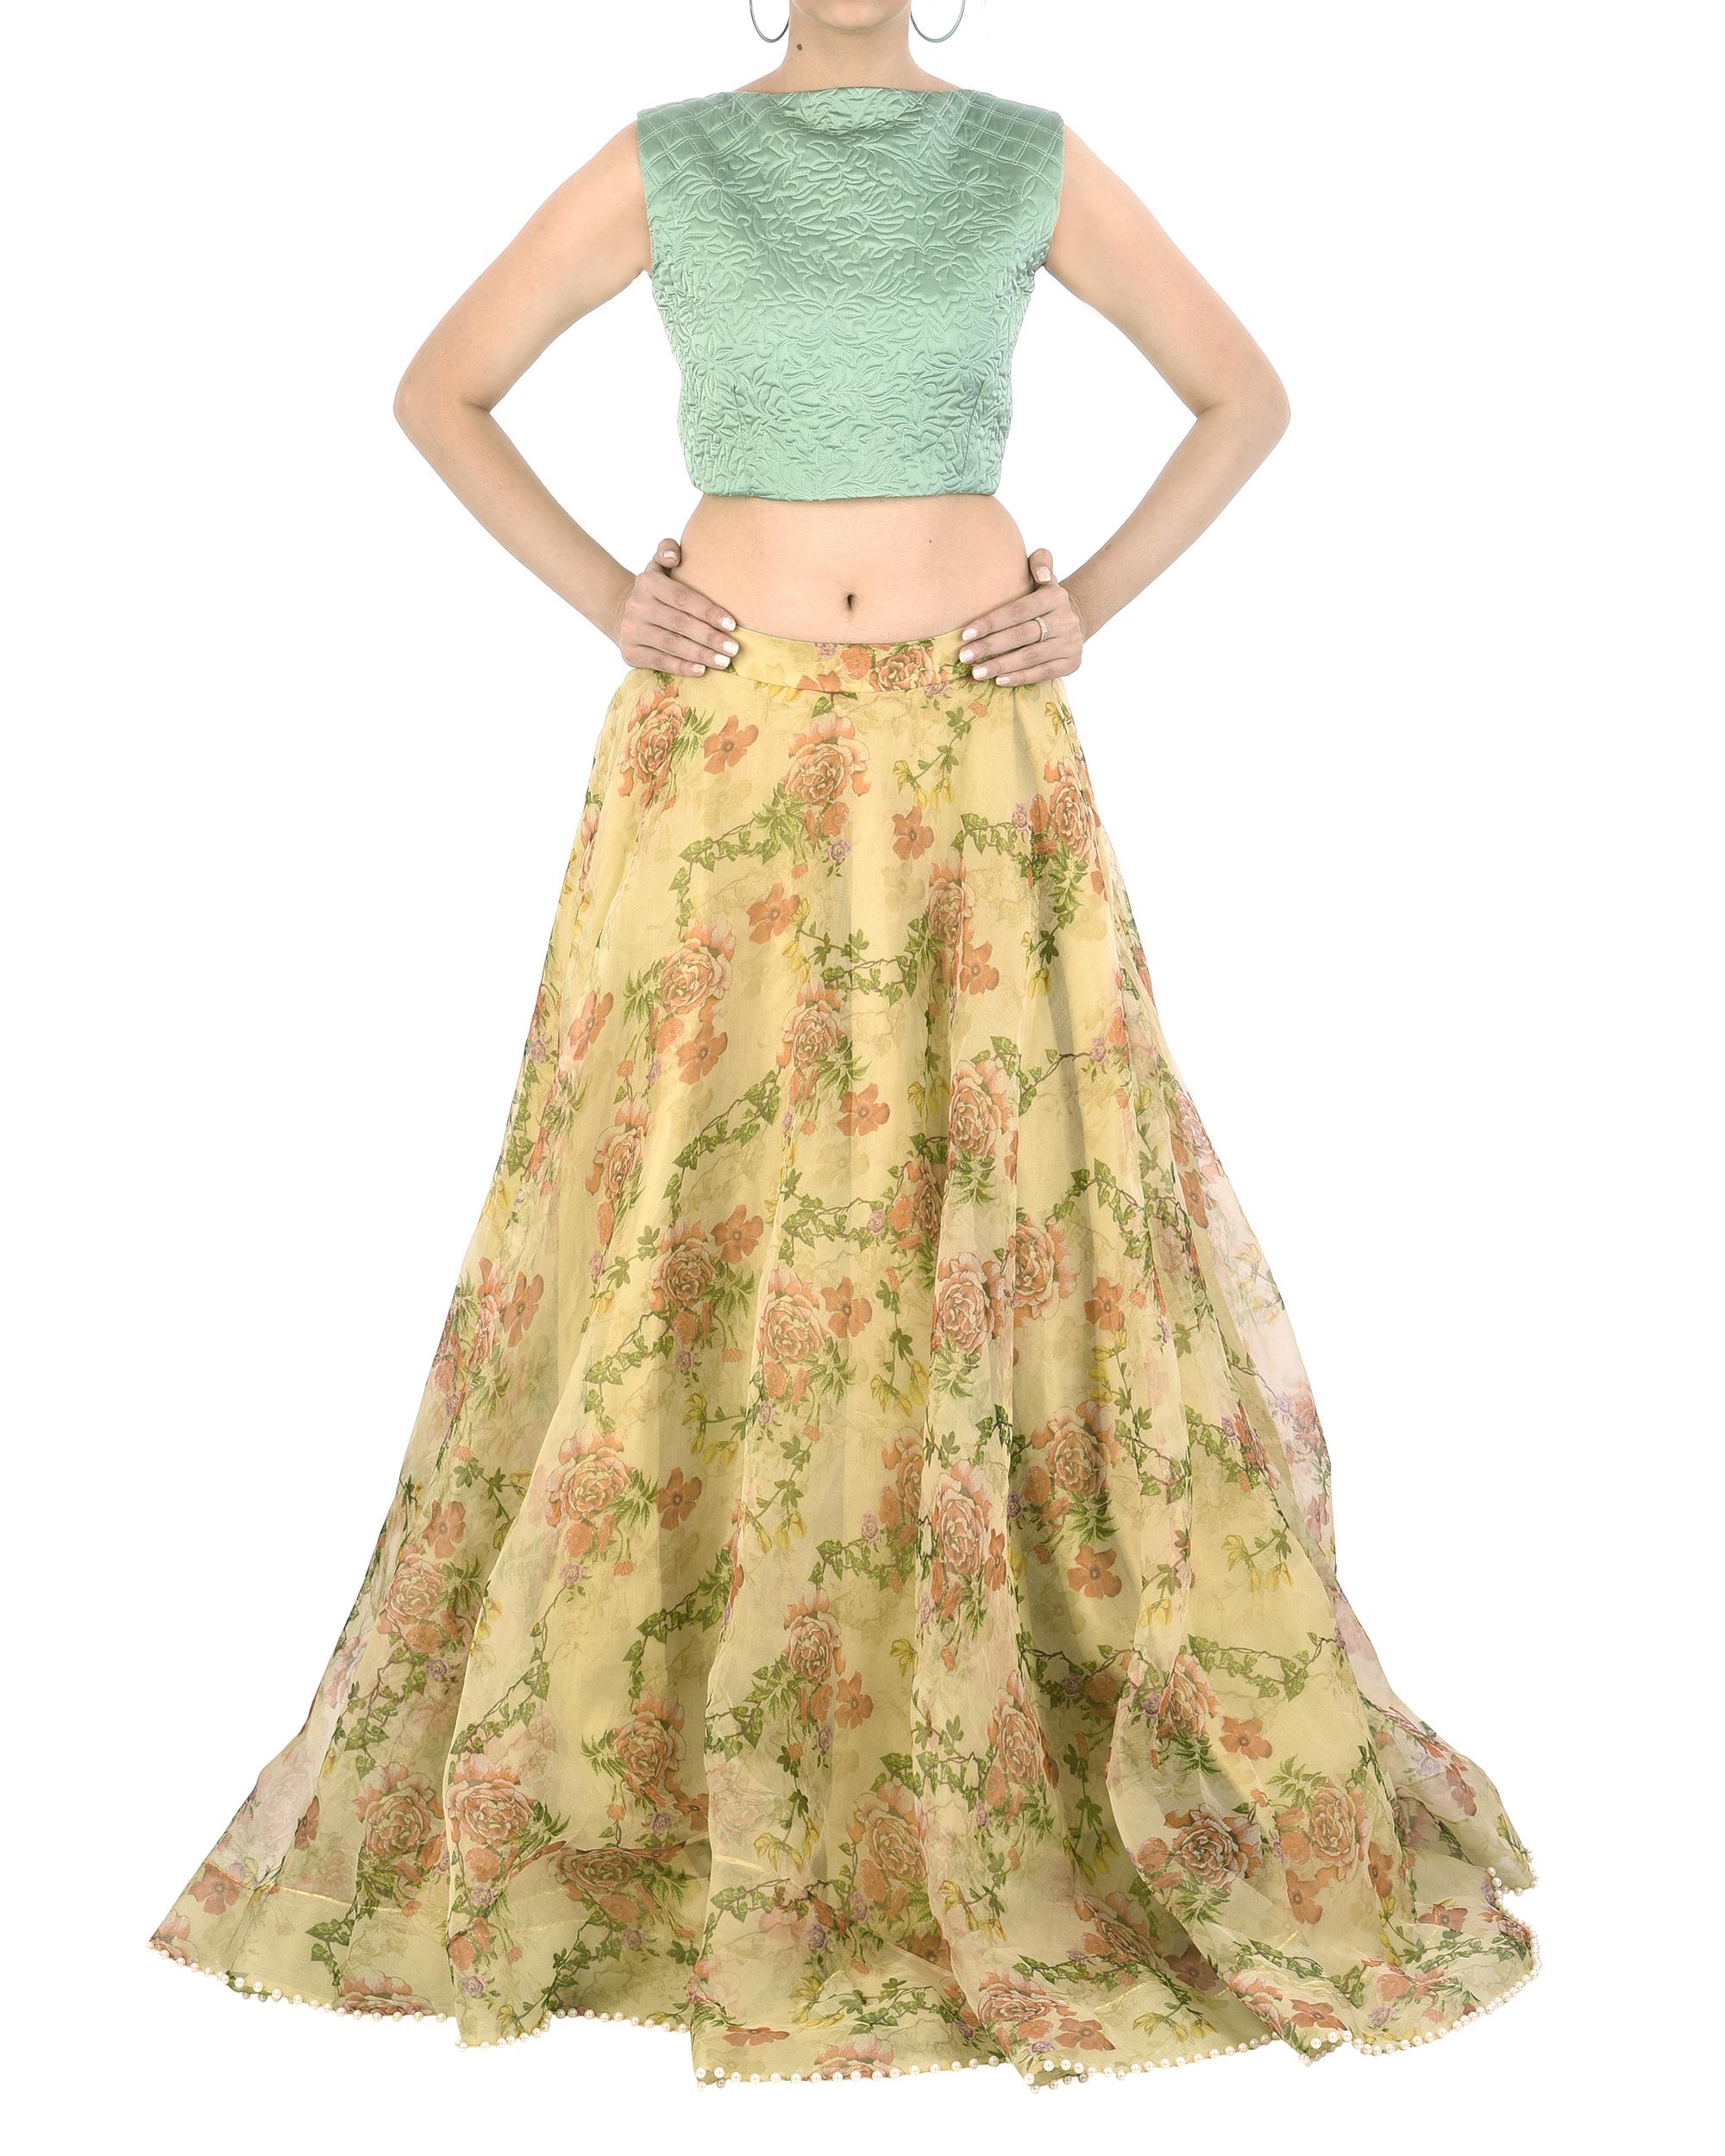 Floral organza lehenga skirt